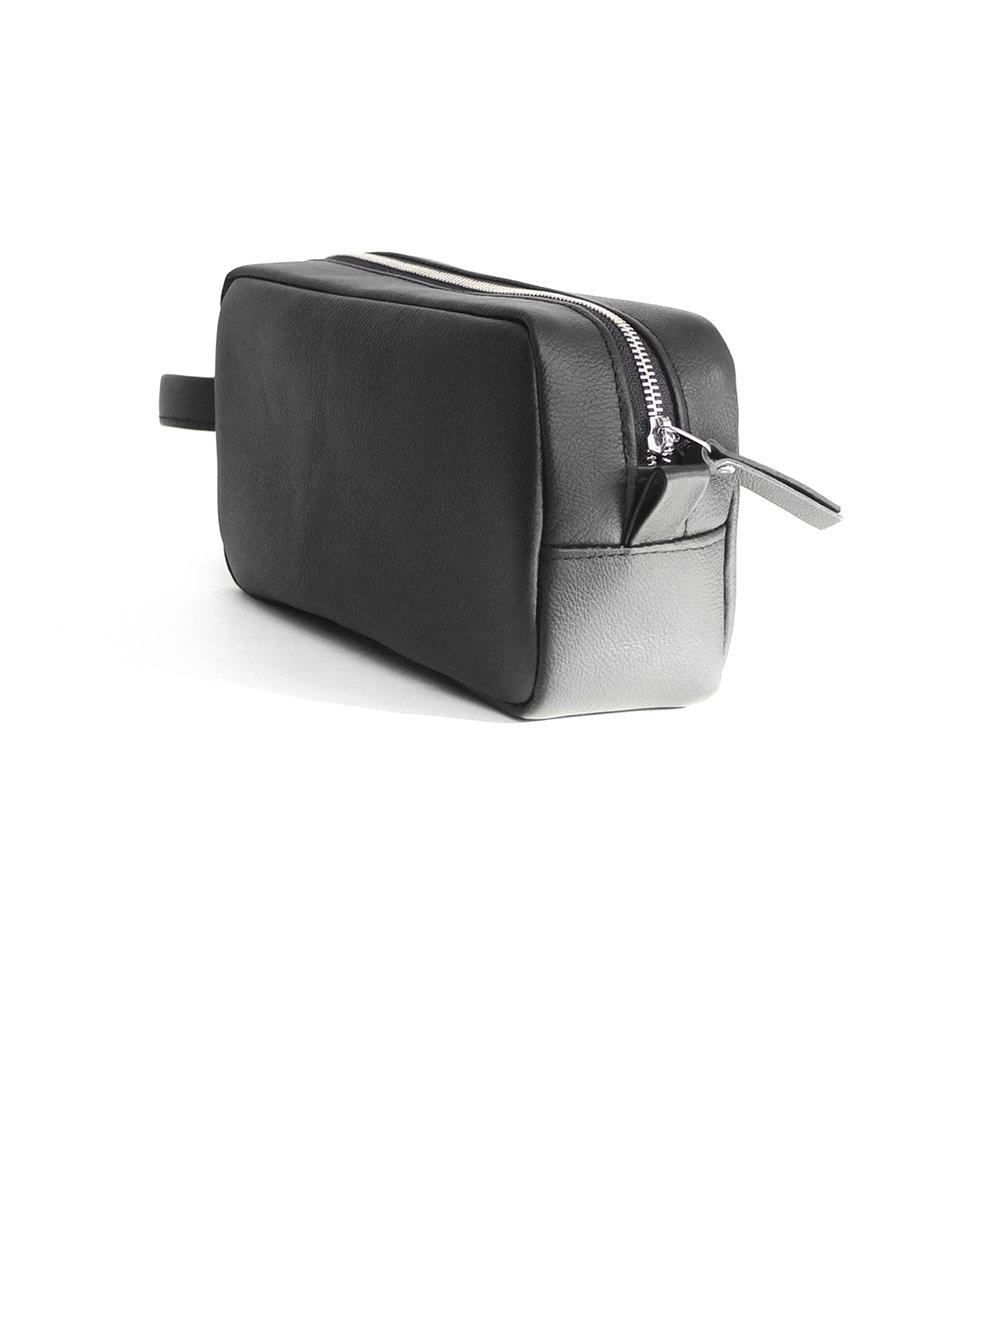 Leather dopp kit - 90.00$